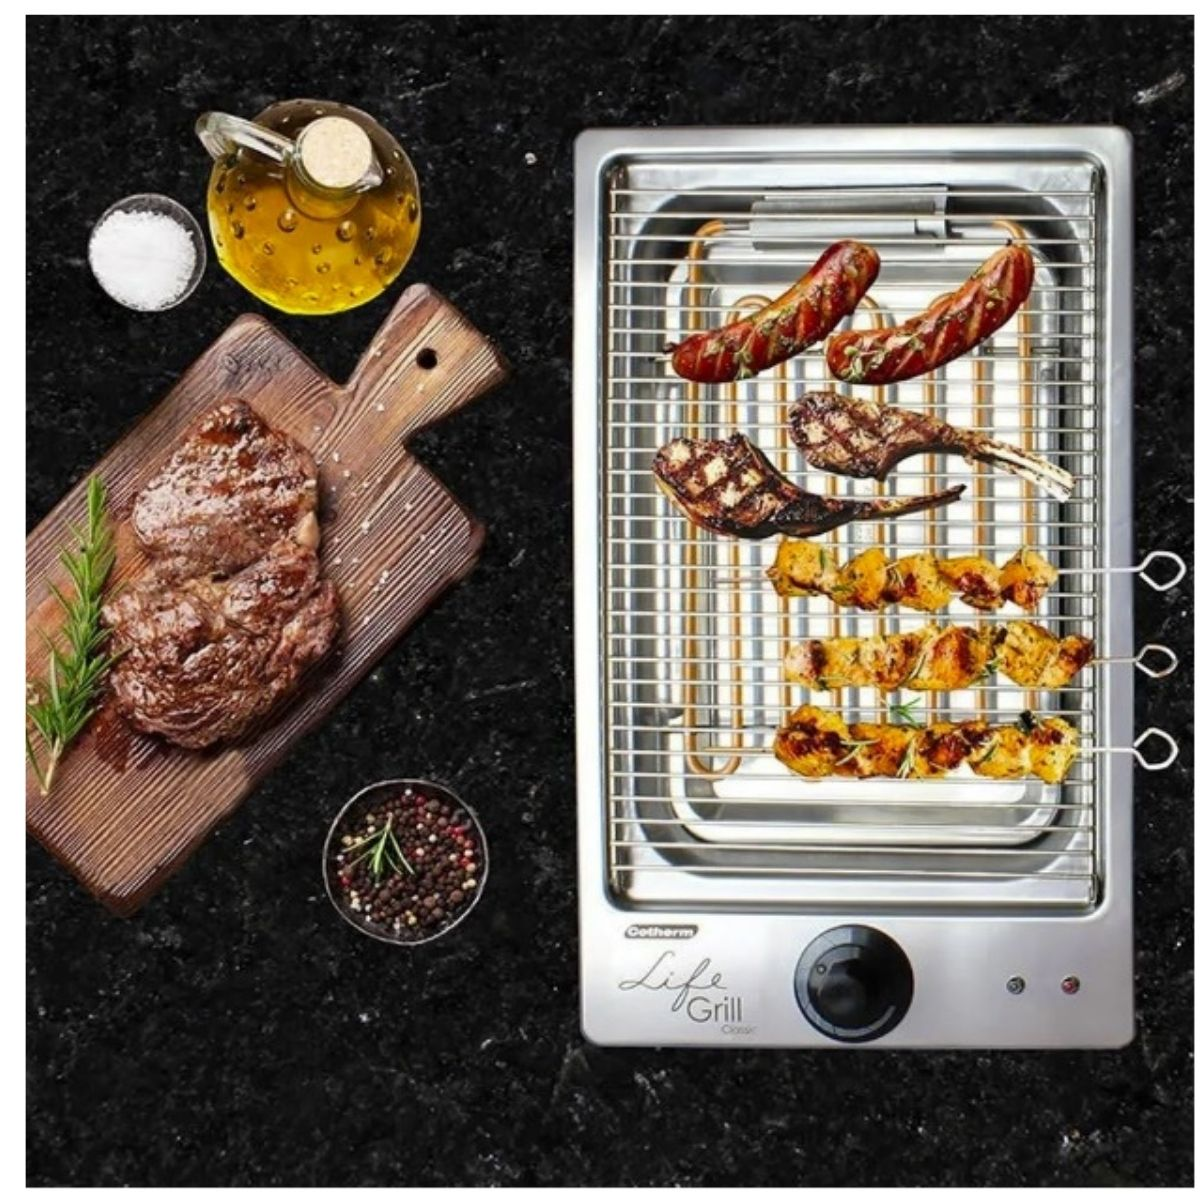 Churrasqueira Elétrica Cotherm Life Grill Classic